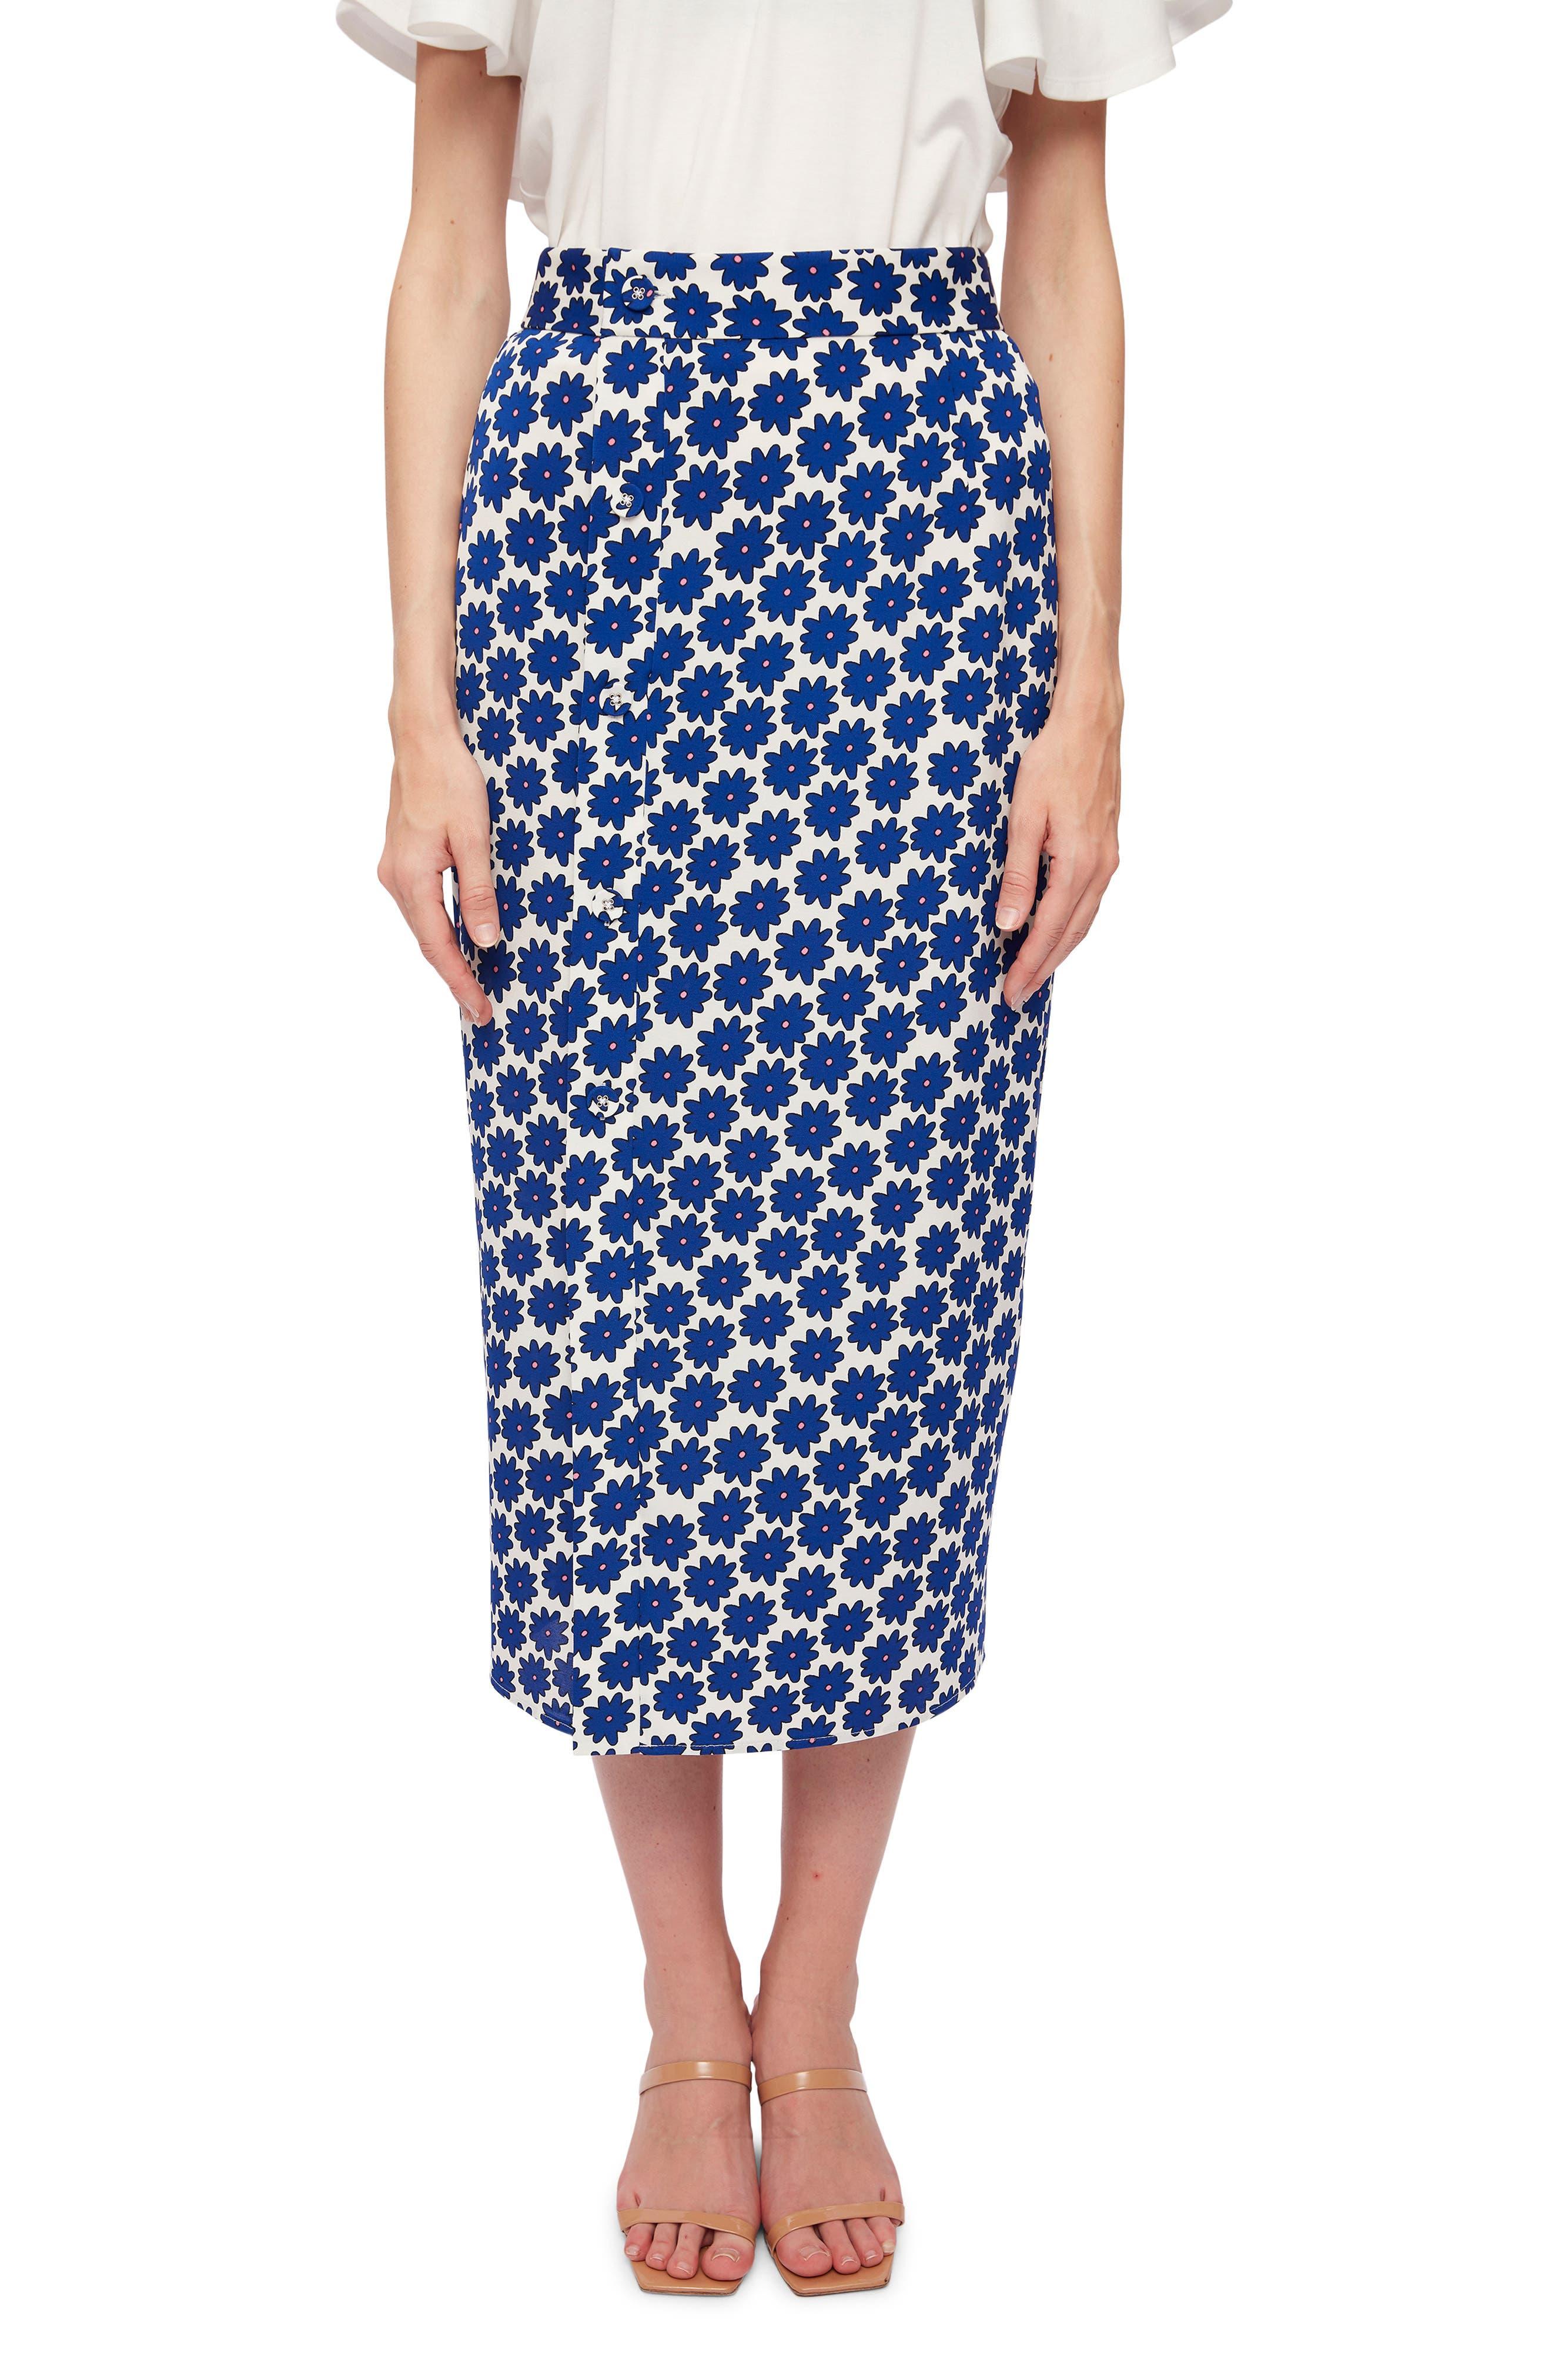 Calandra Print Skirt